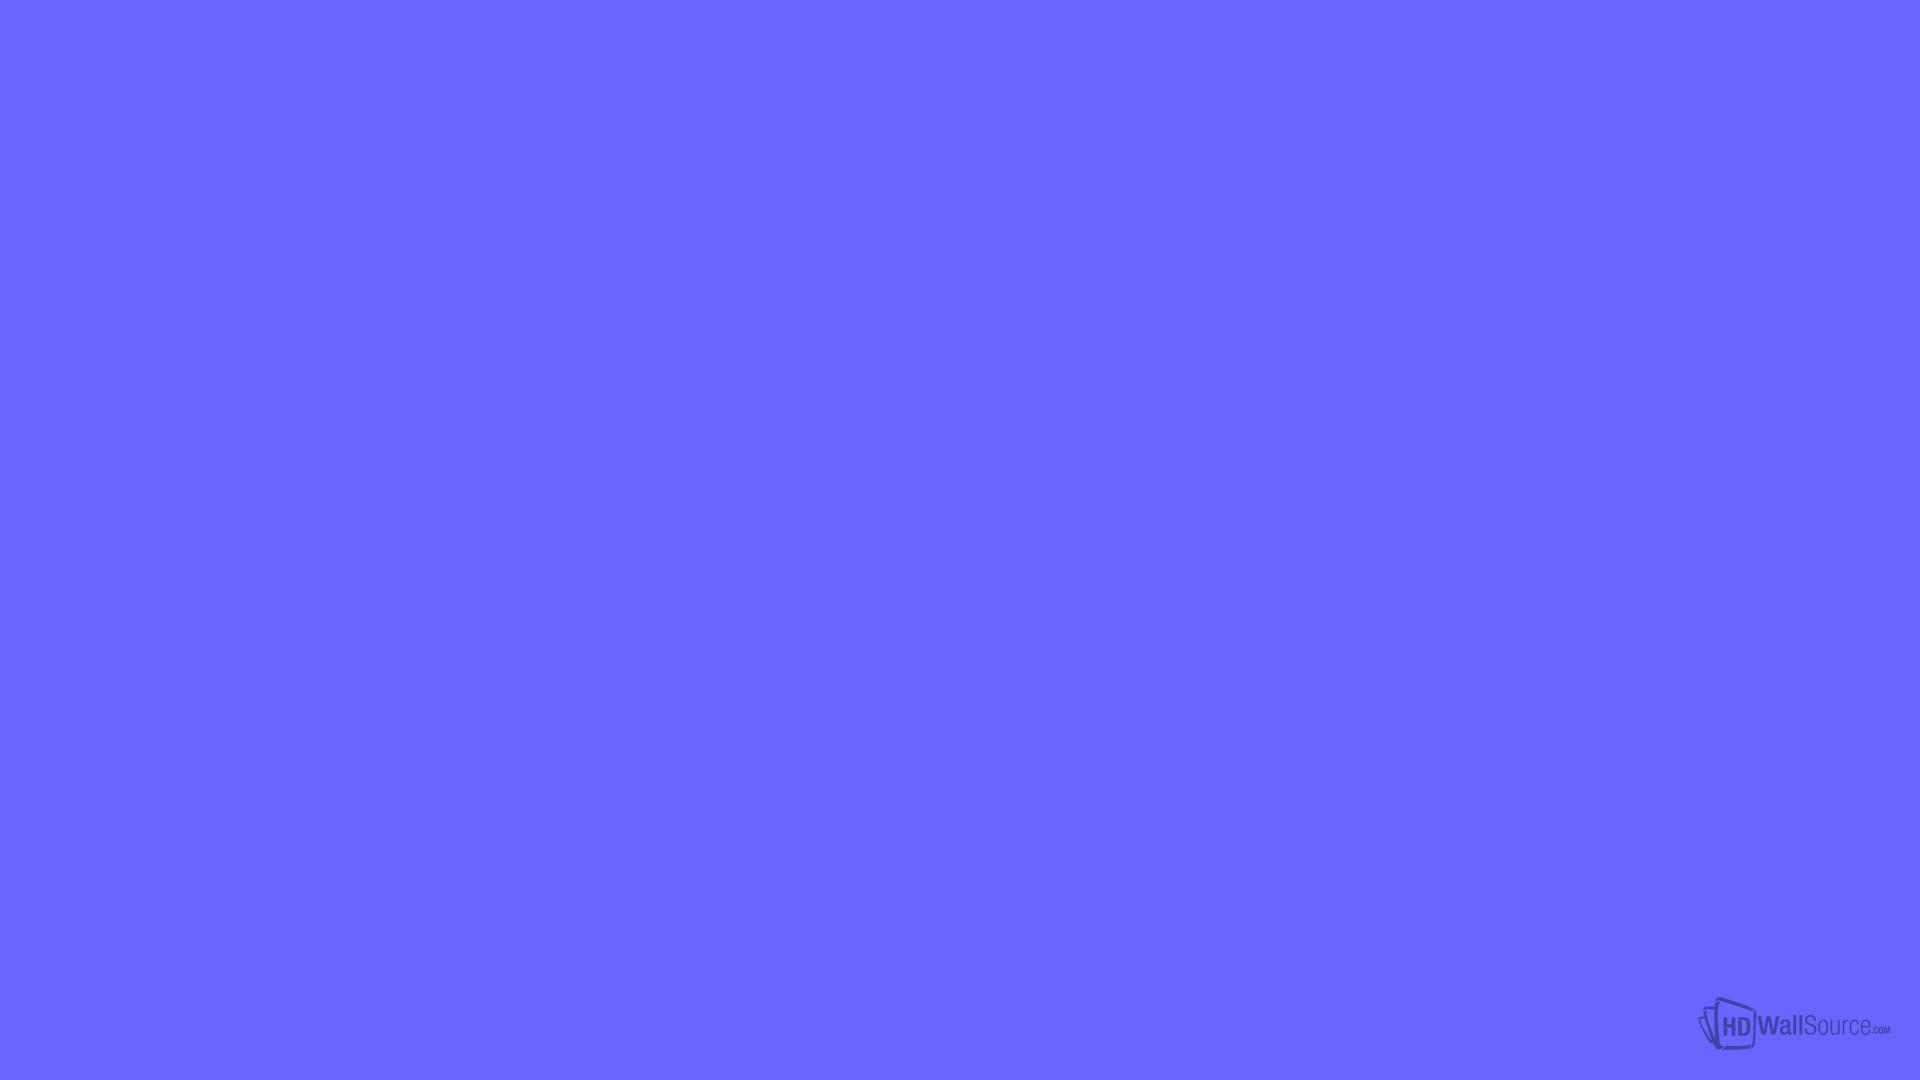 6666ff wallpaper 71058